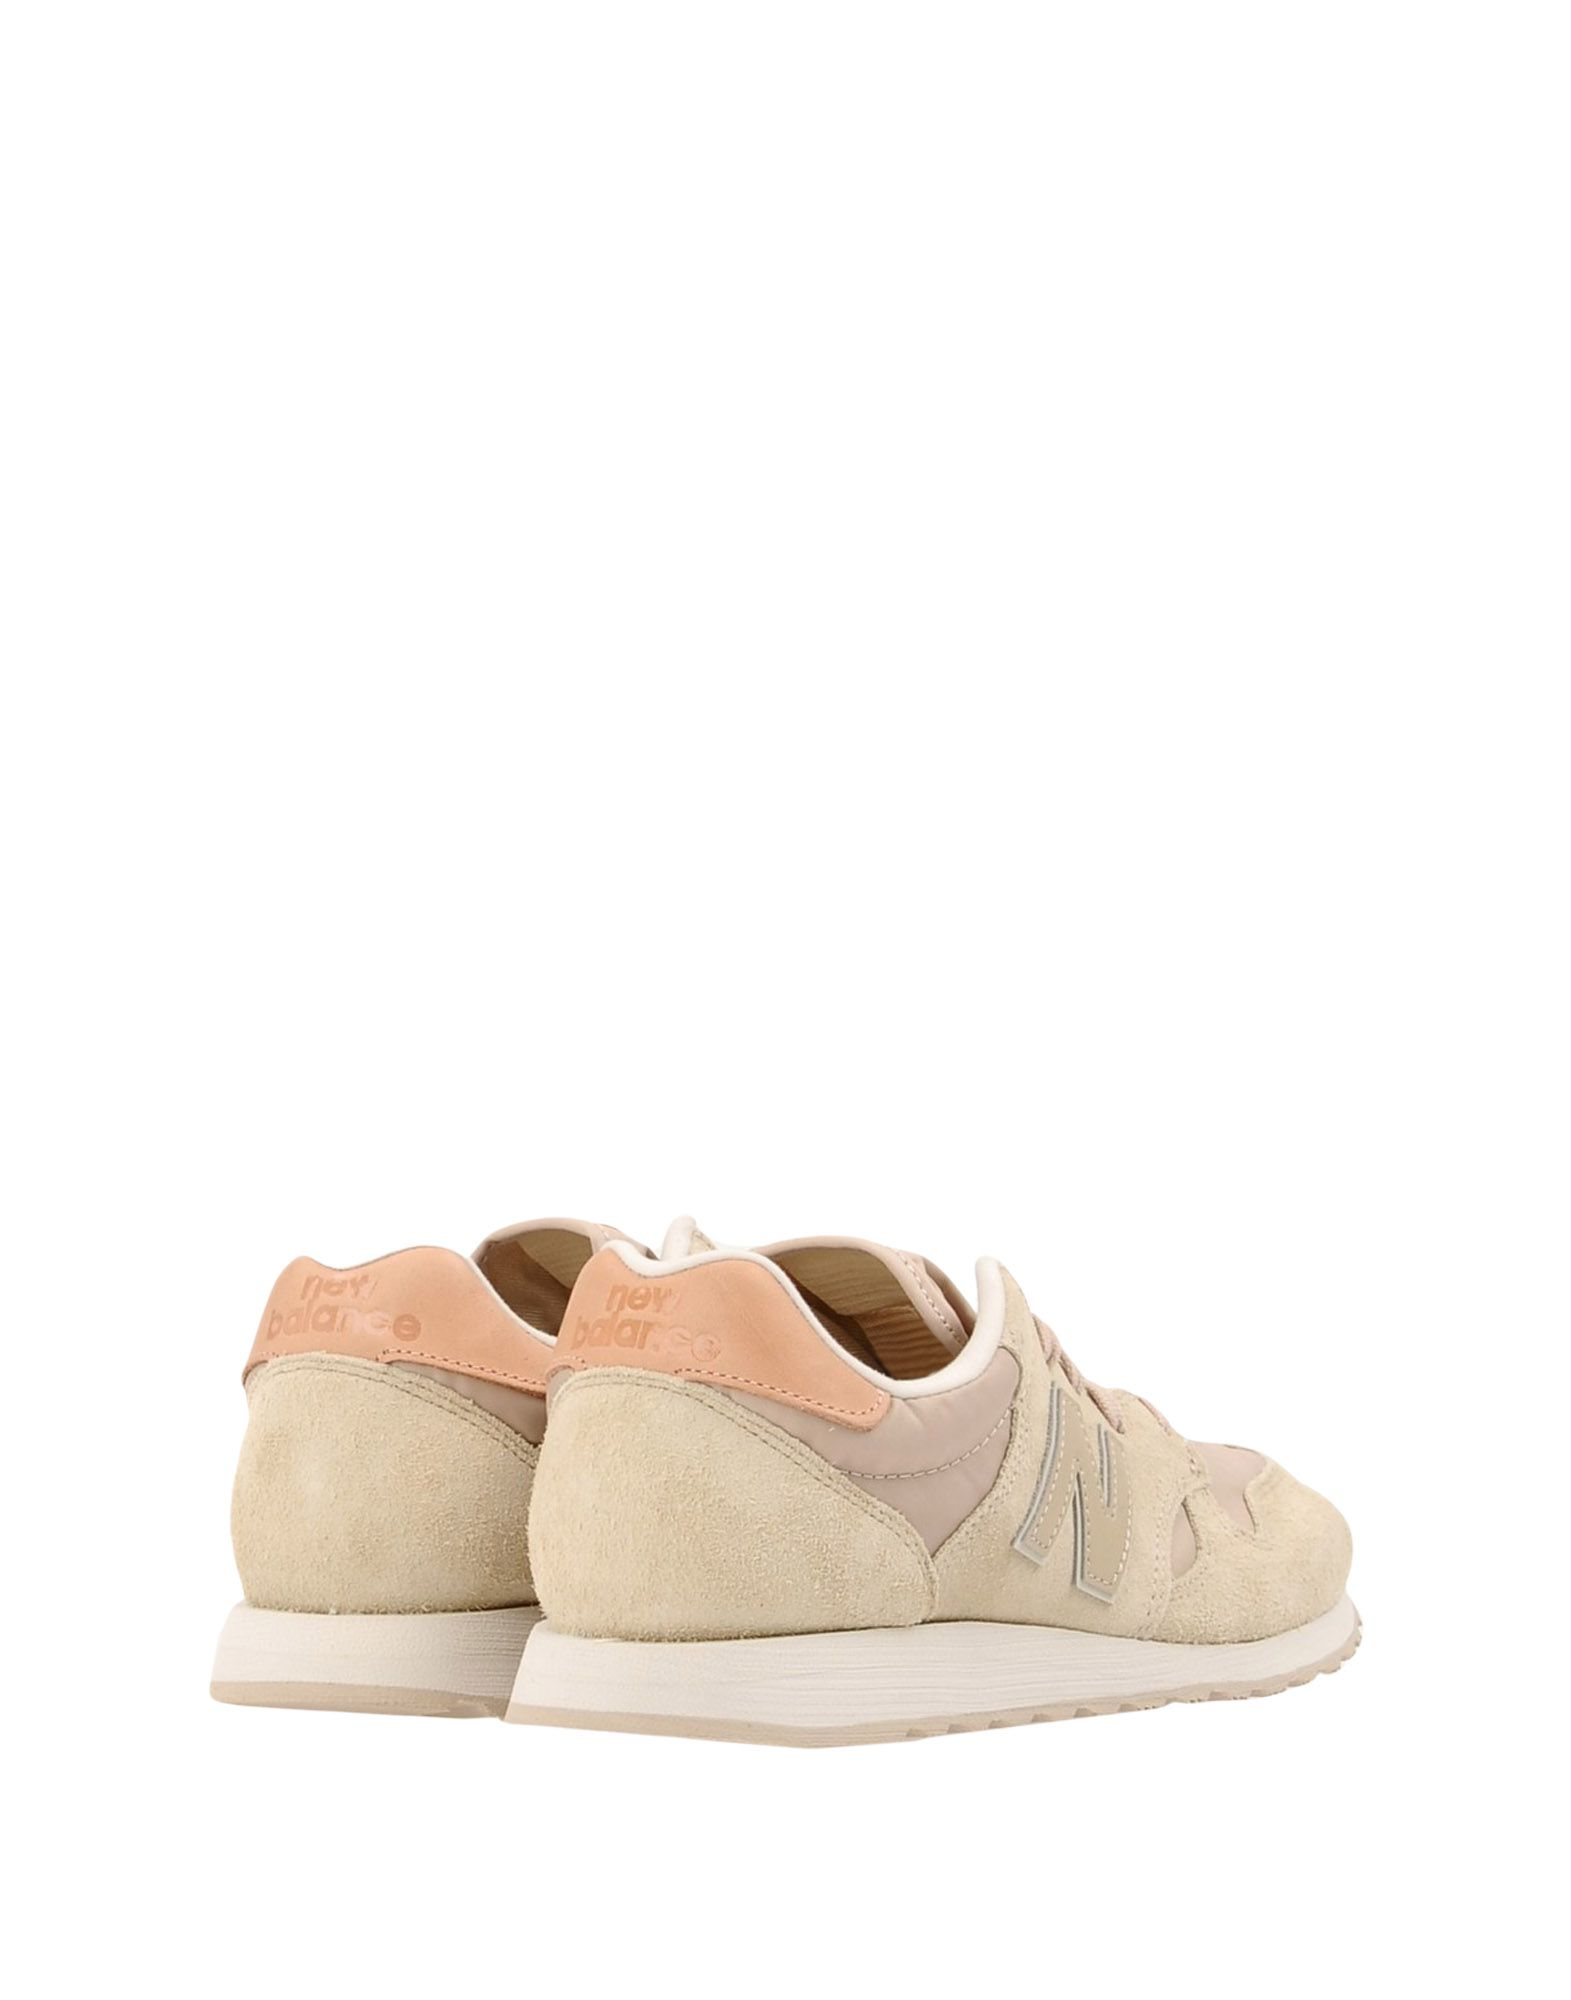 New 11334199OL Balance 520 Vintage  11334199OL New Gute Qualität beliebte Schuhe 26b6a5